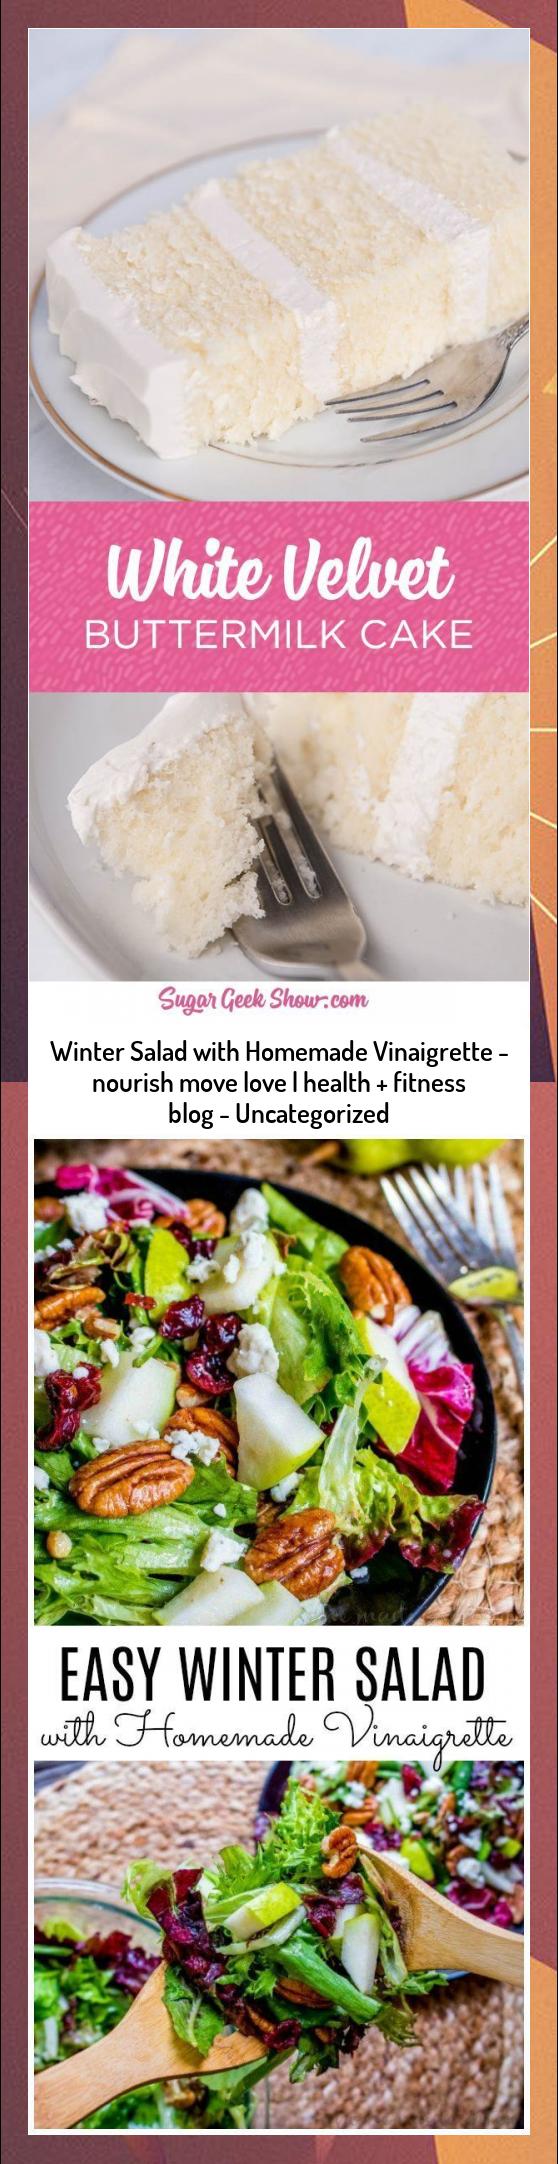 Winter Salad with Homemade Vinaigrette - nourish move love | health + fitness blog - Uncategorized #...